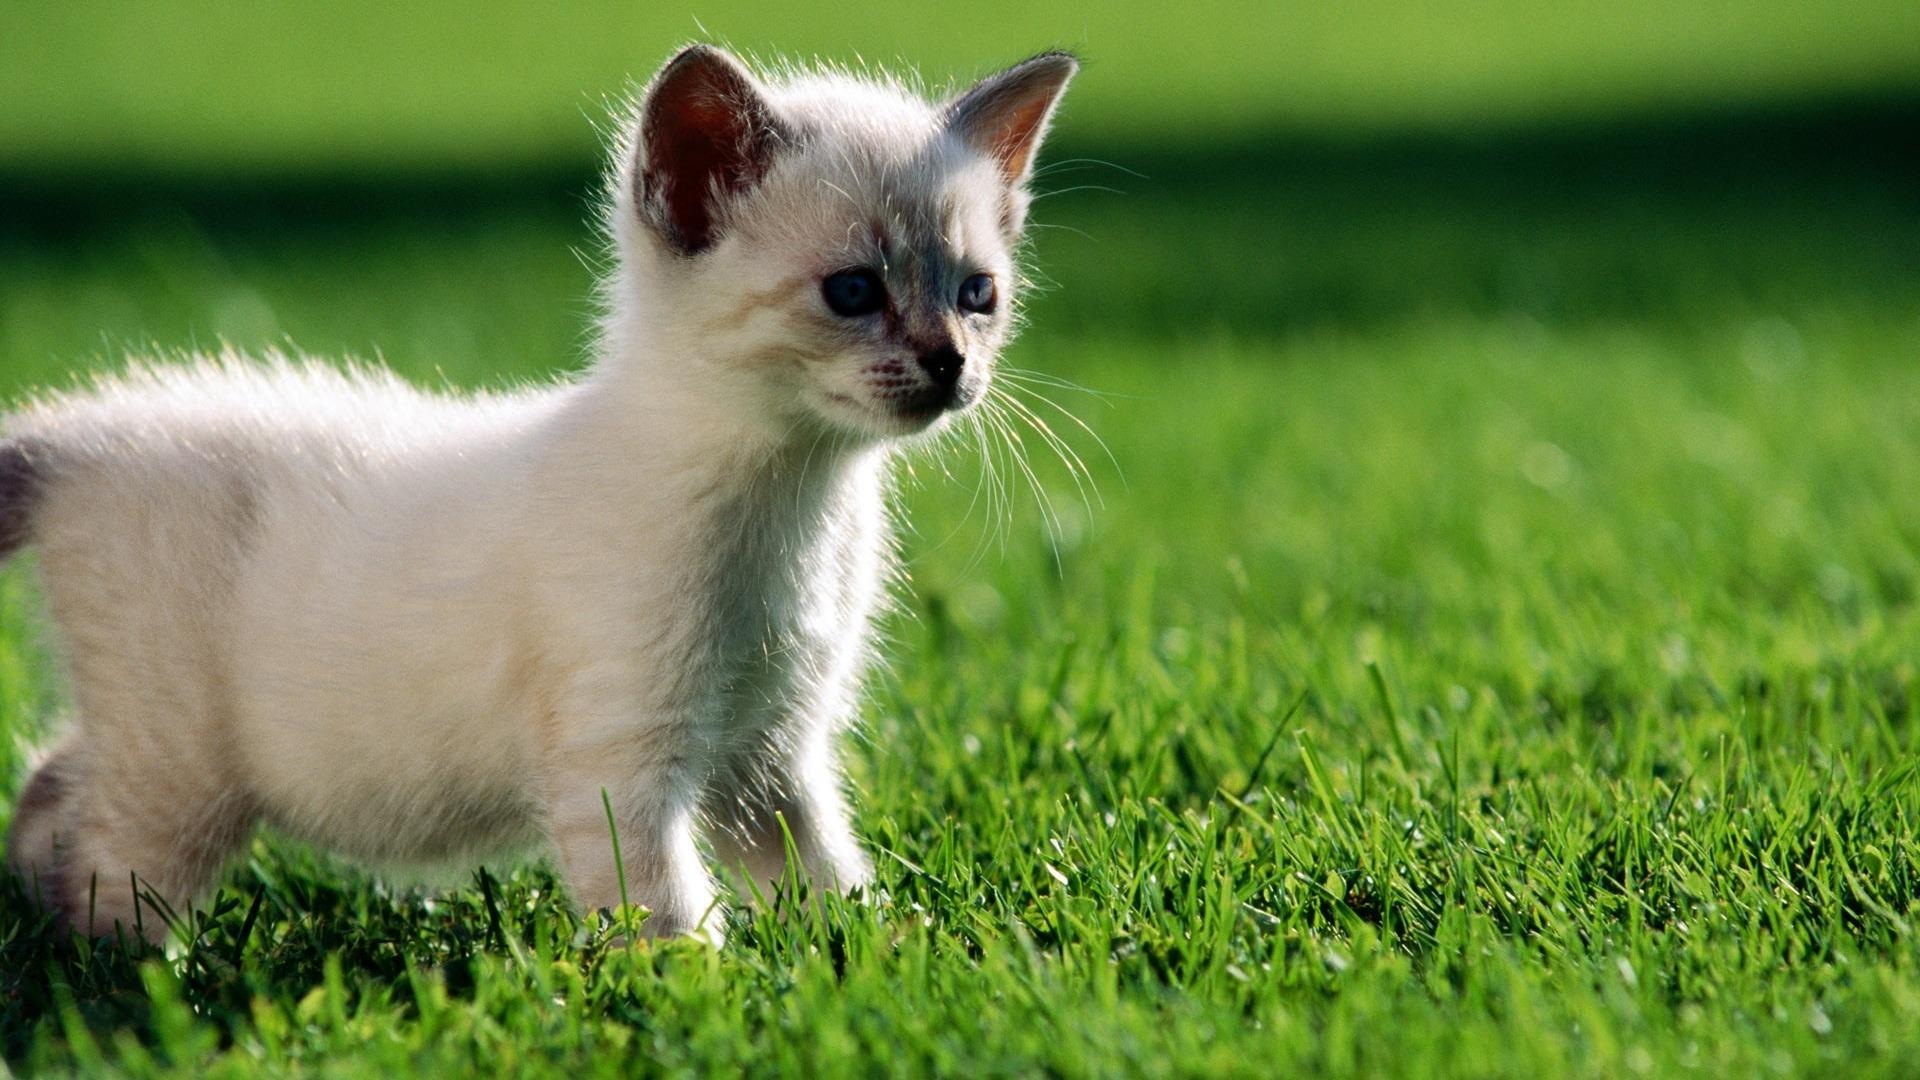 Sfondi desktop hd animali gattino curioso sfondi hd gratis for Sfondi animali hd